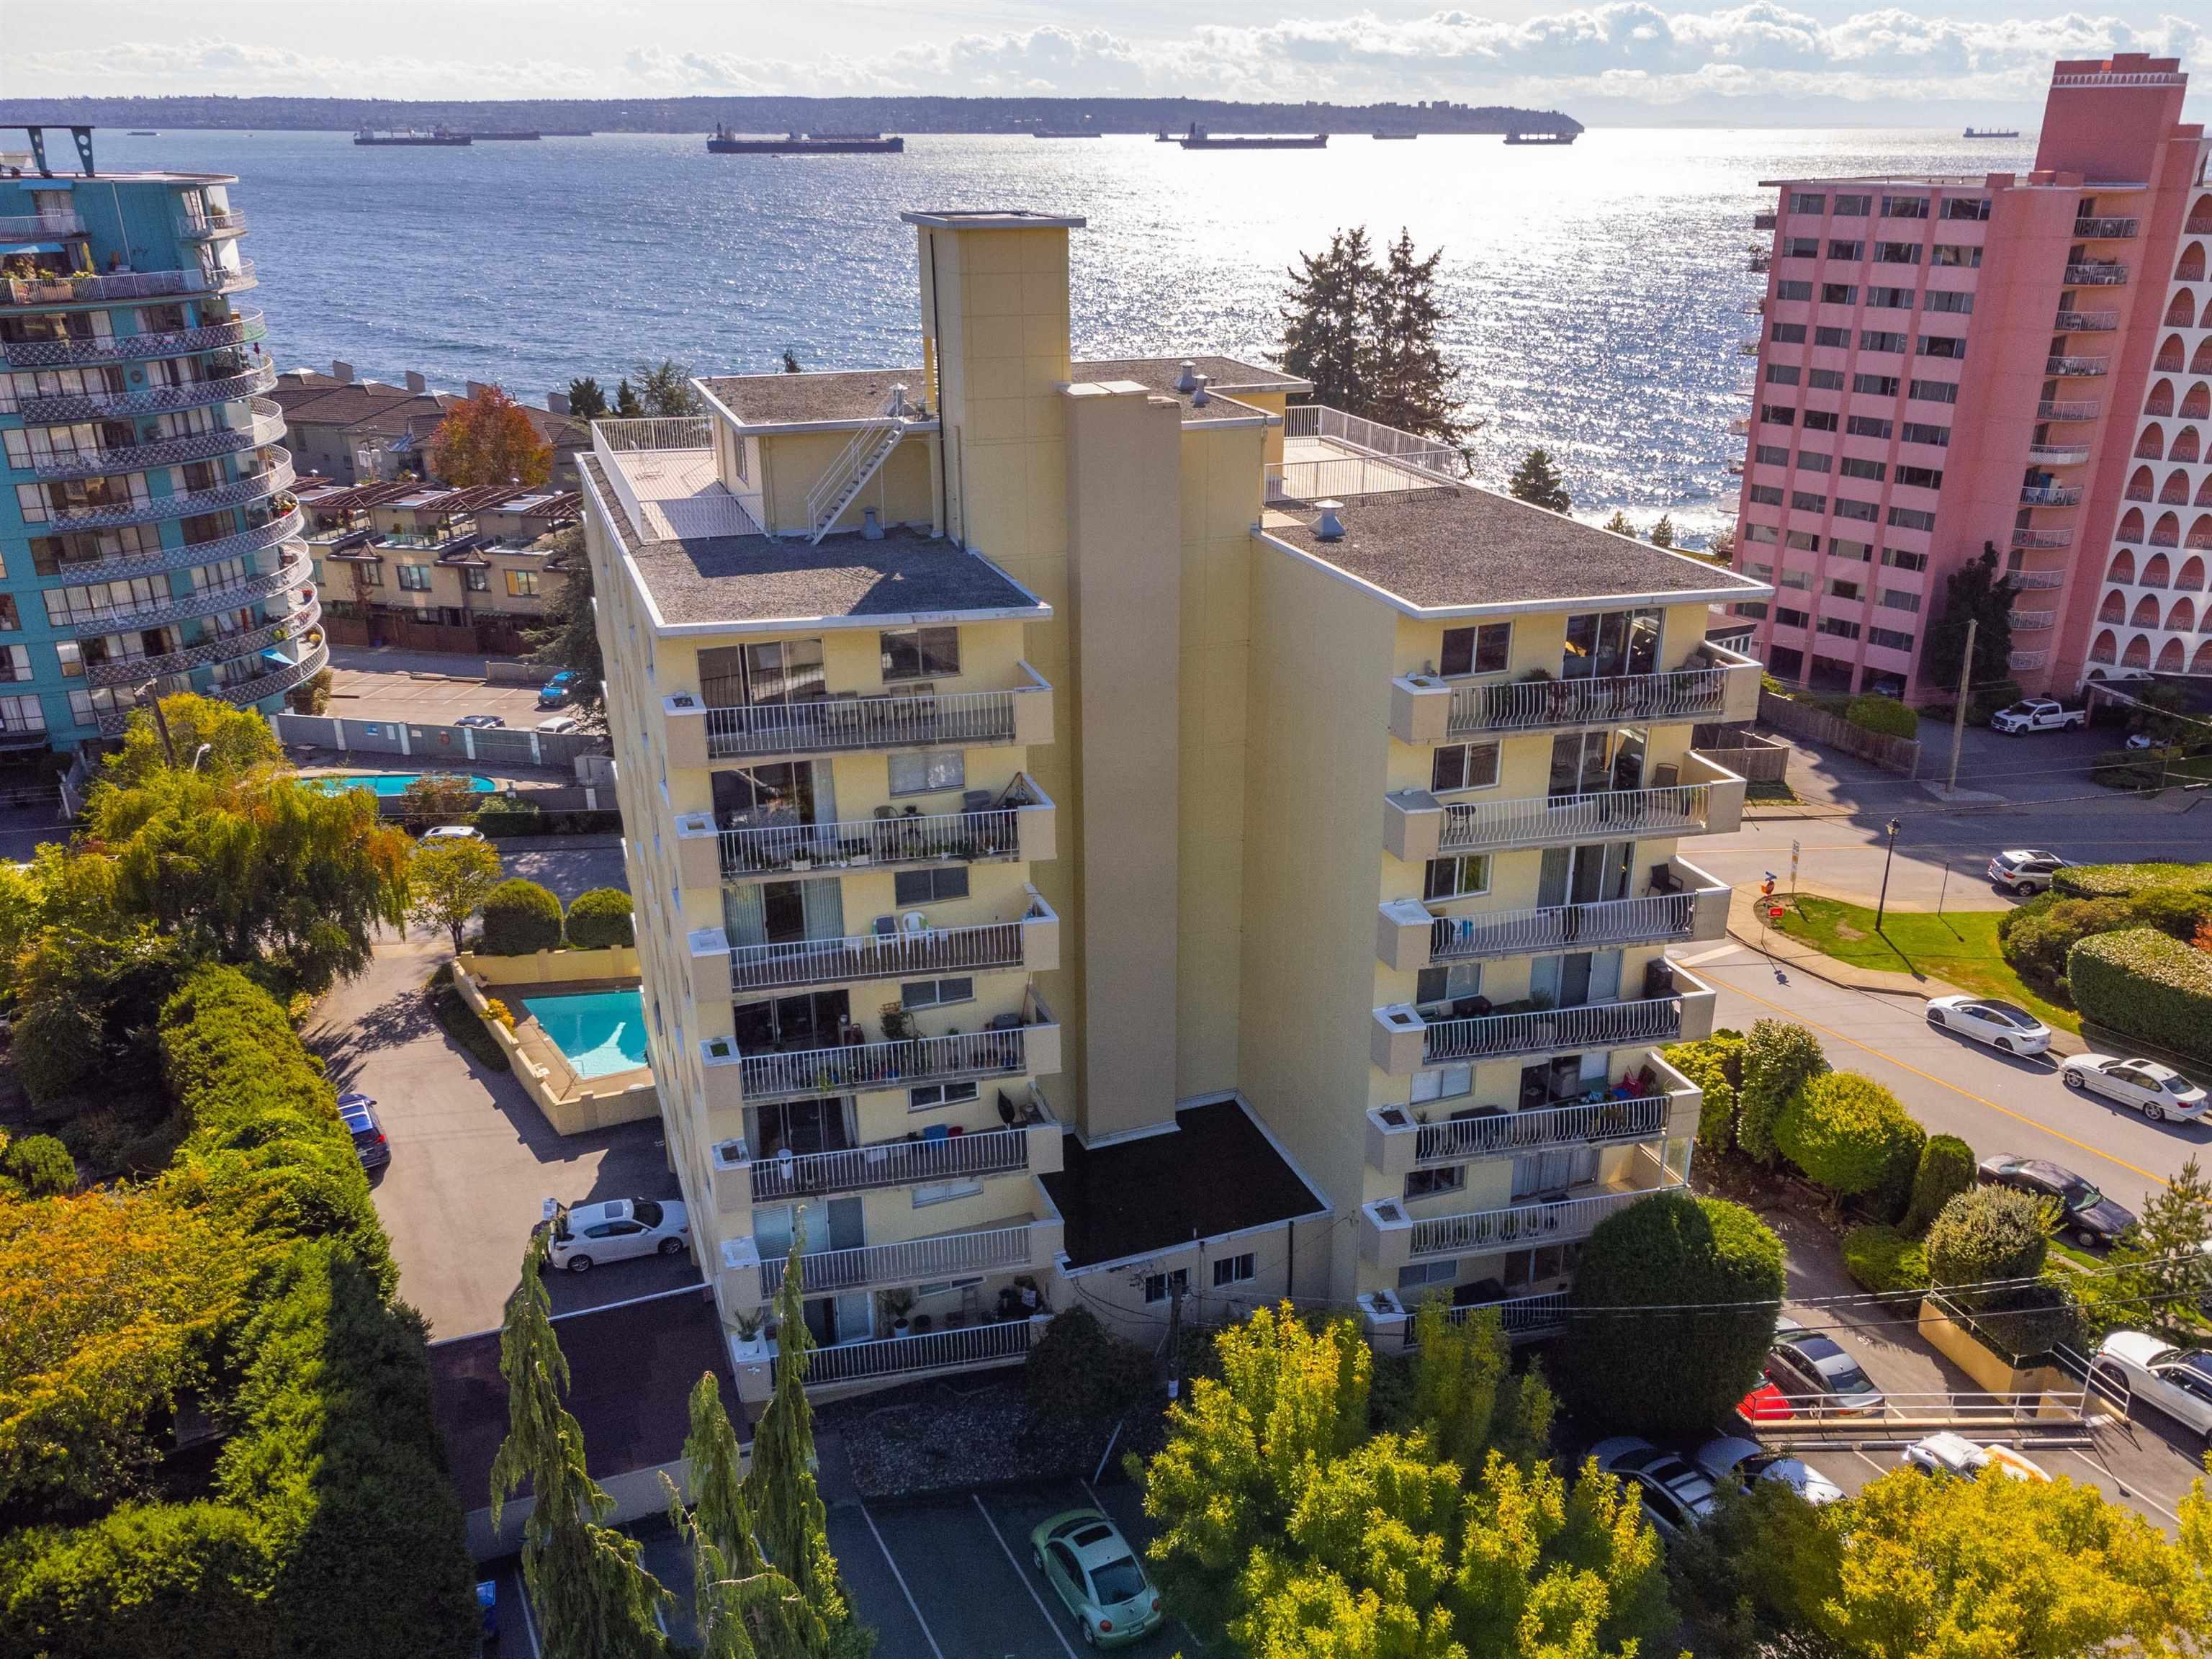 601 2187 BELLEVUE AVENUE - Dundarave Apartment/Condo for sale, 1 Bedroom (R2620121) - #1